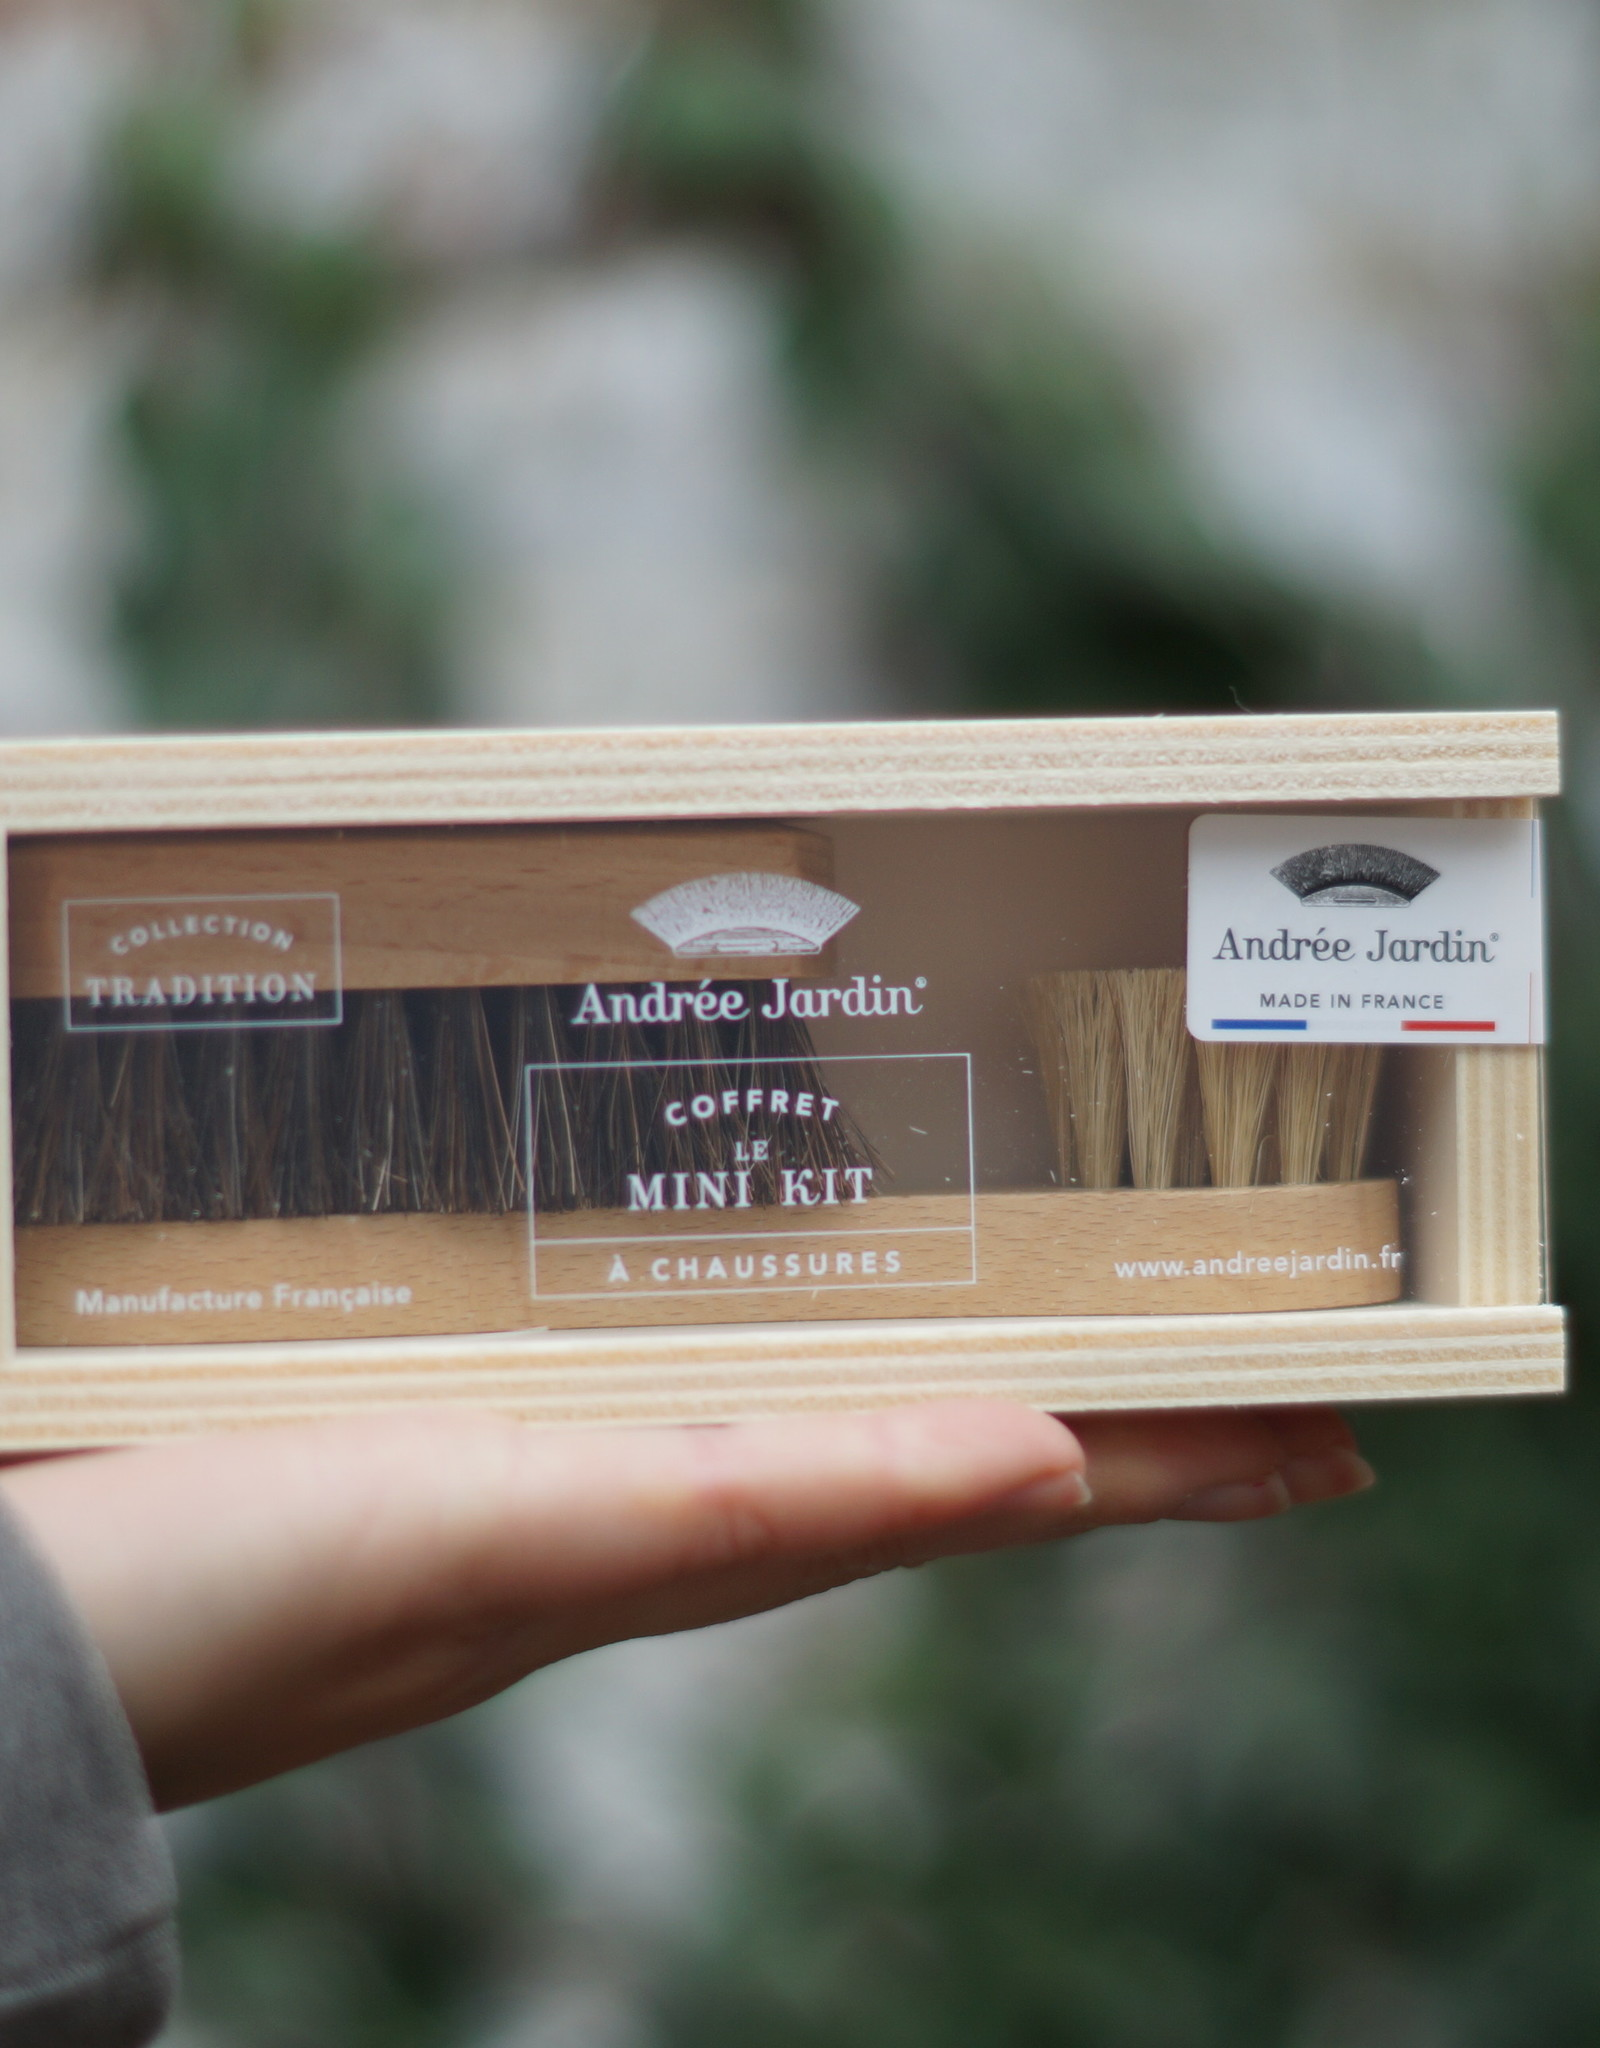 Andrée Jardin Shoe kit